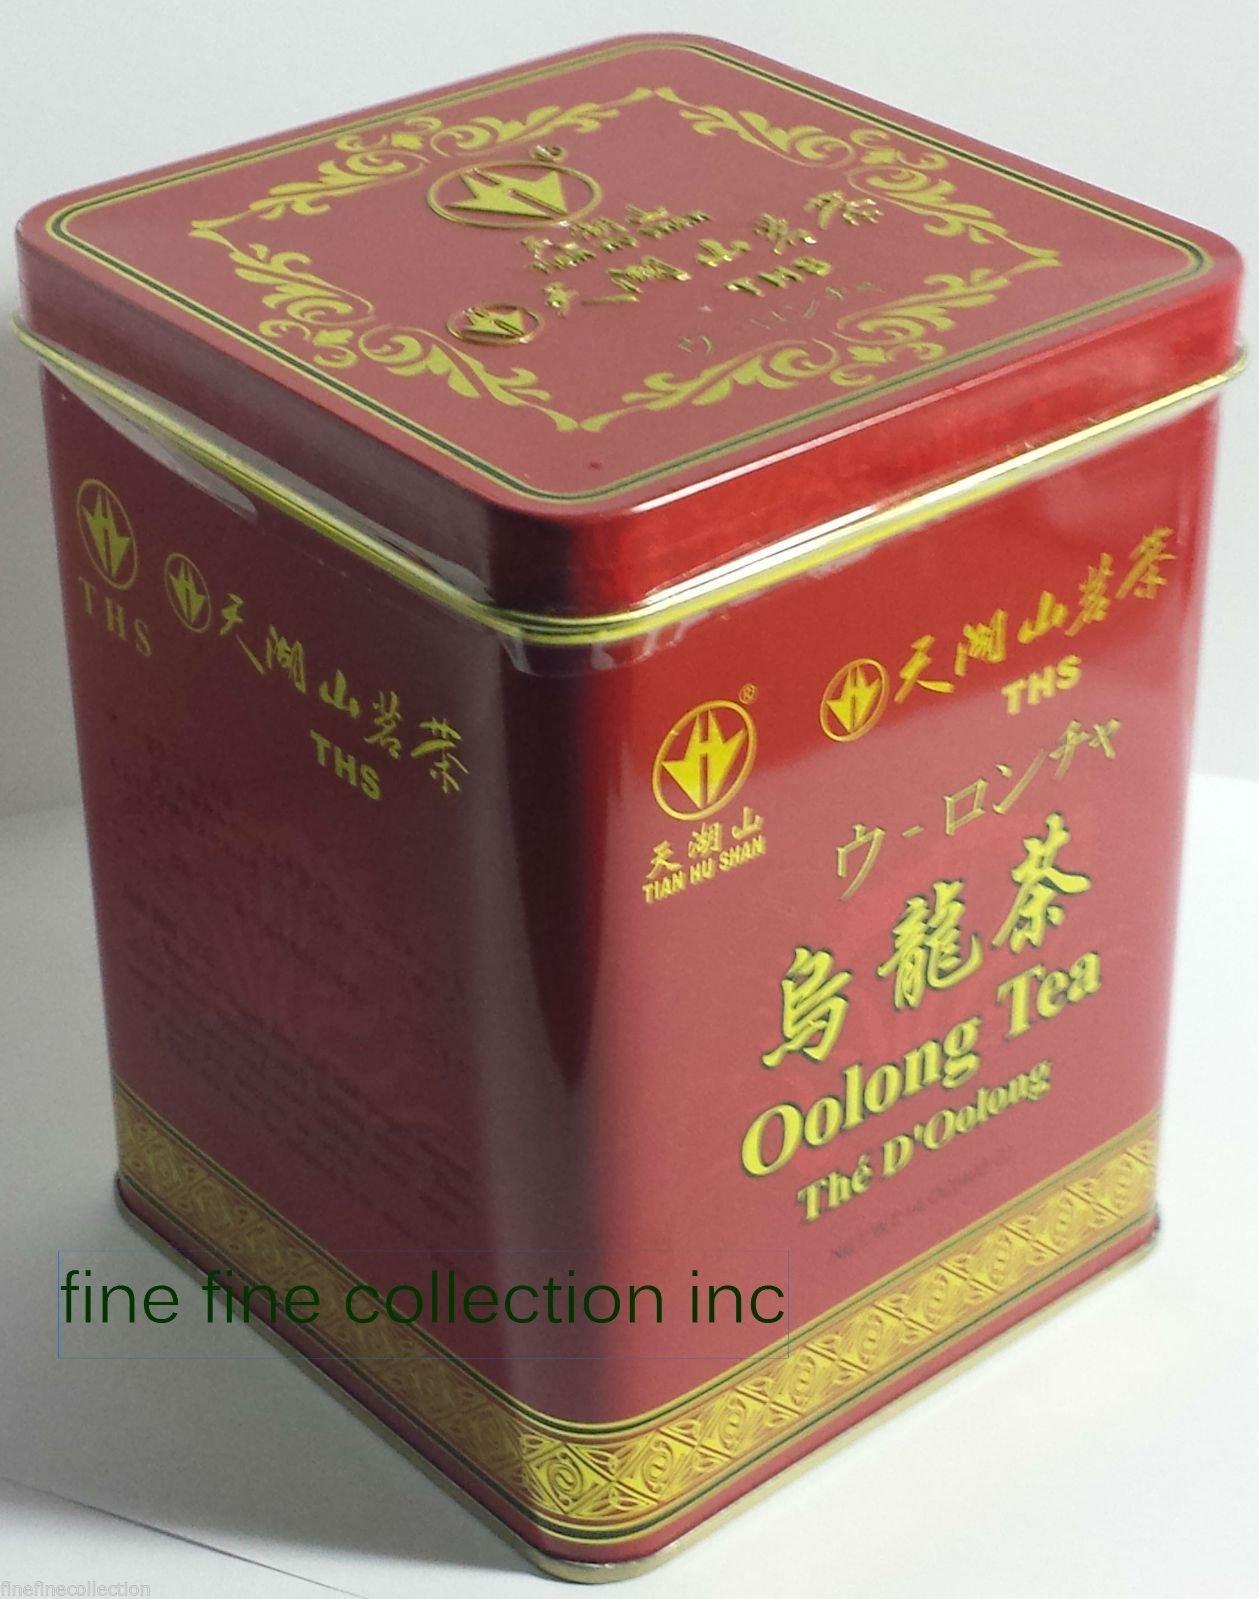 TIAN HU SHAN BRAND CHINA OOLONG loose leaf TEA 14 oz (400 g) TIN by Tian Hu Shan